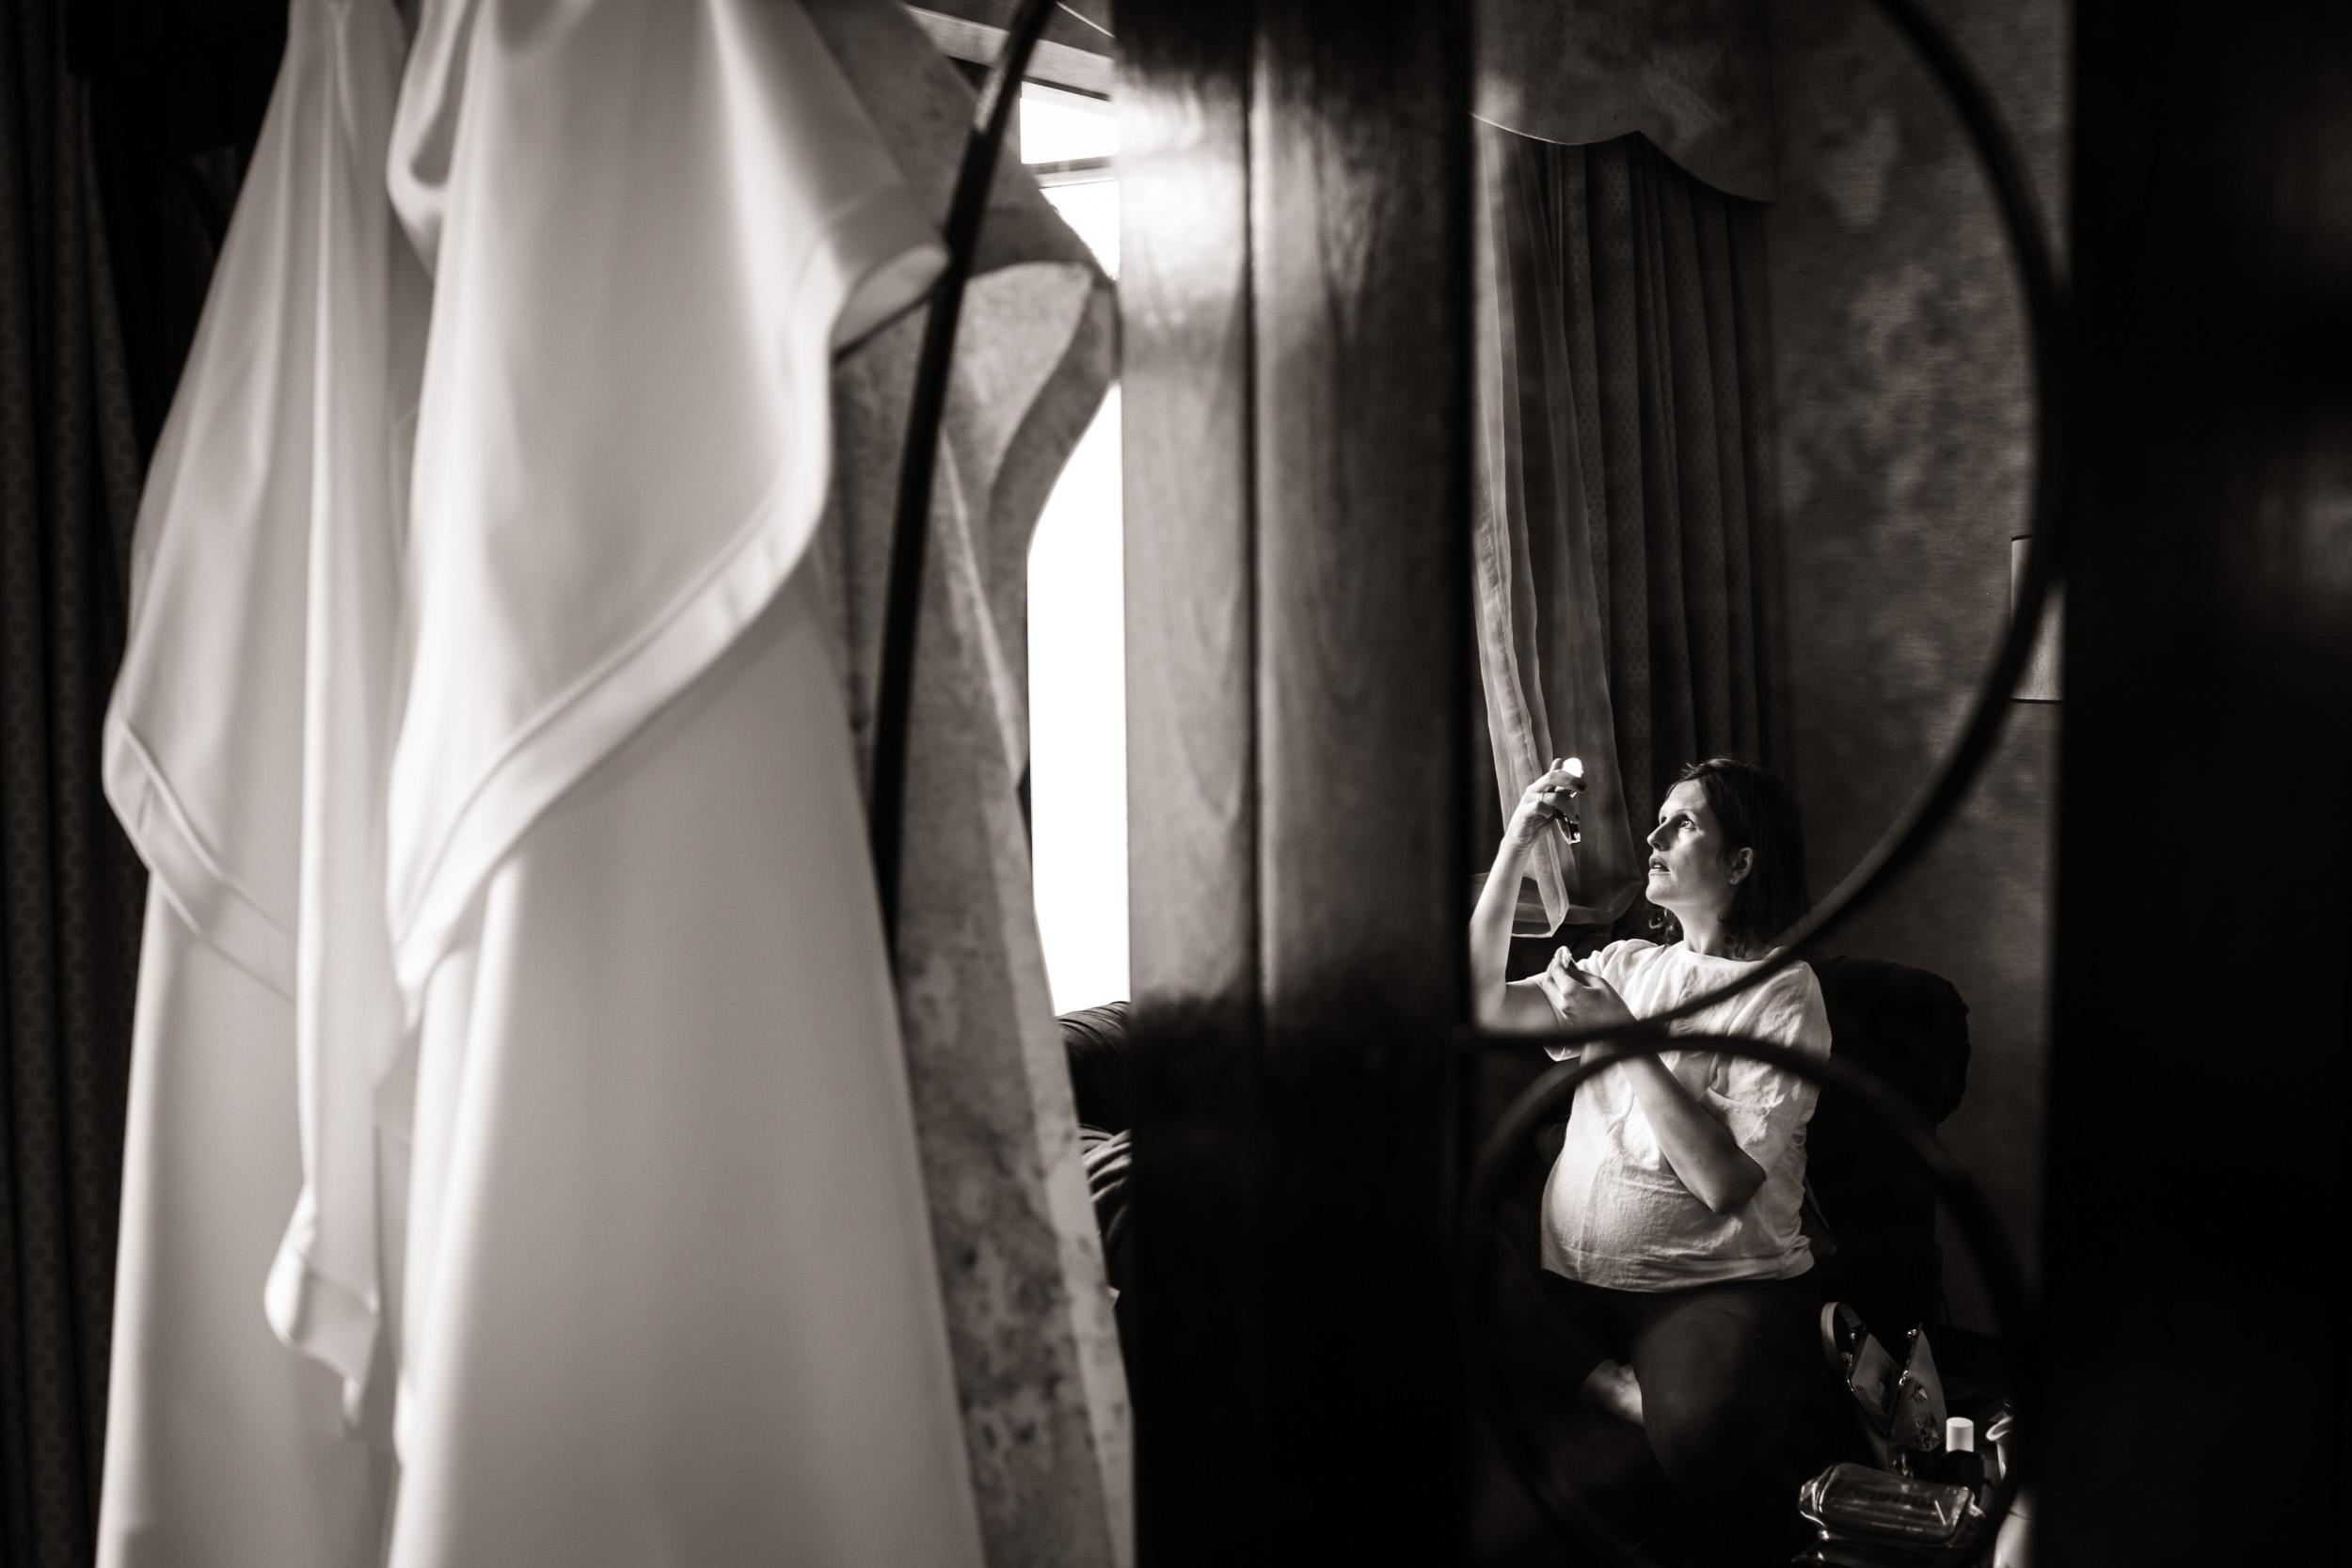 syon-house-wedding-photographer-london 011.jpg